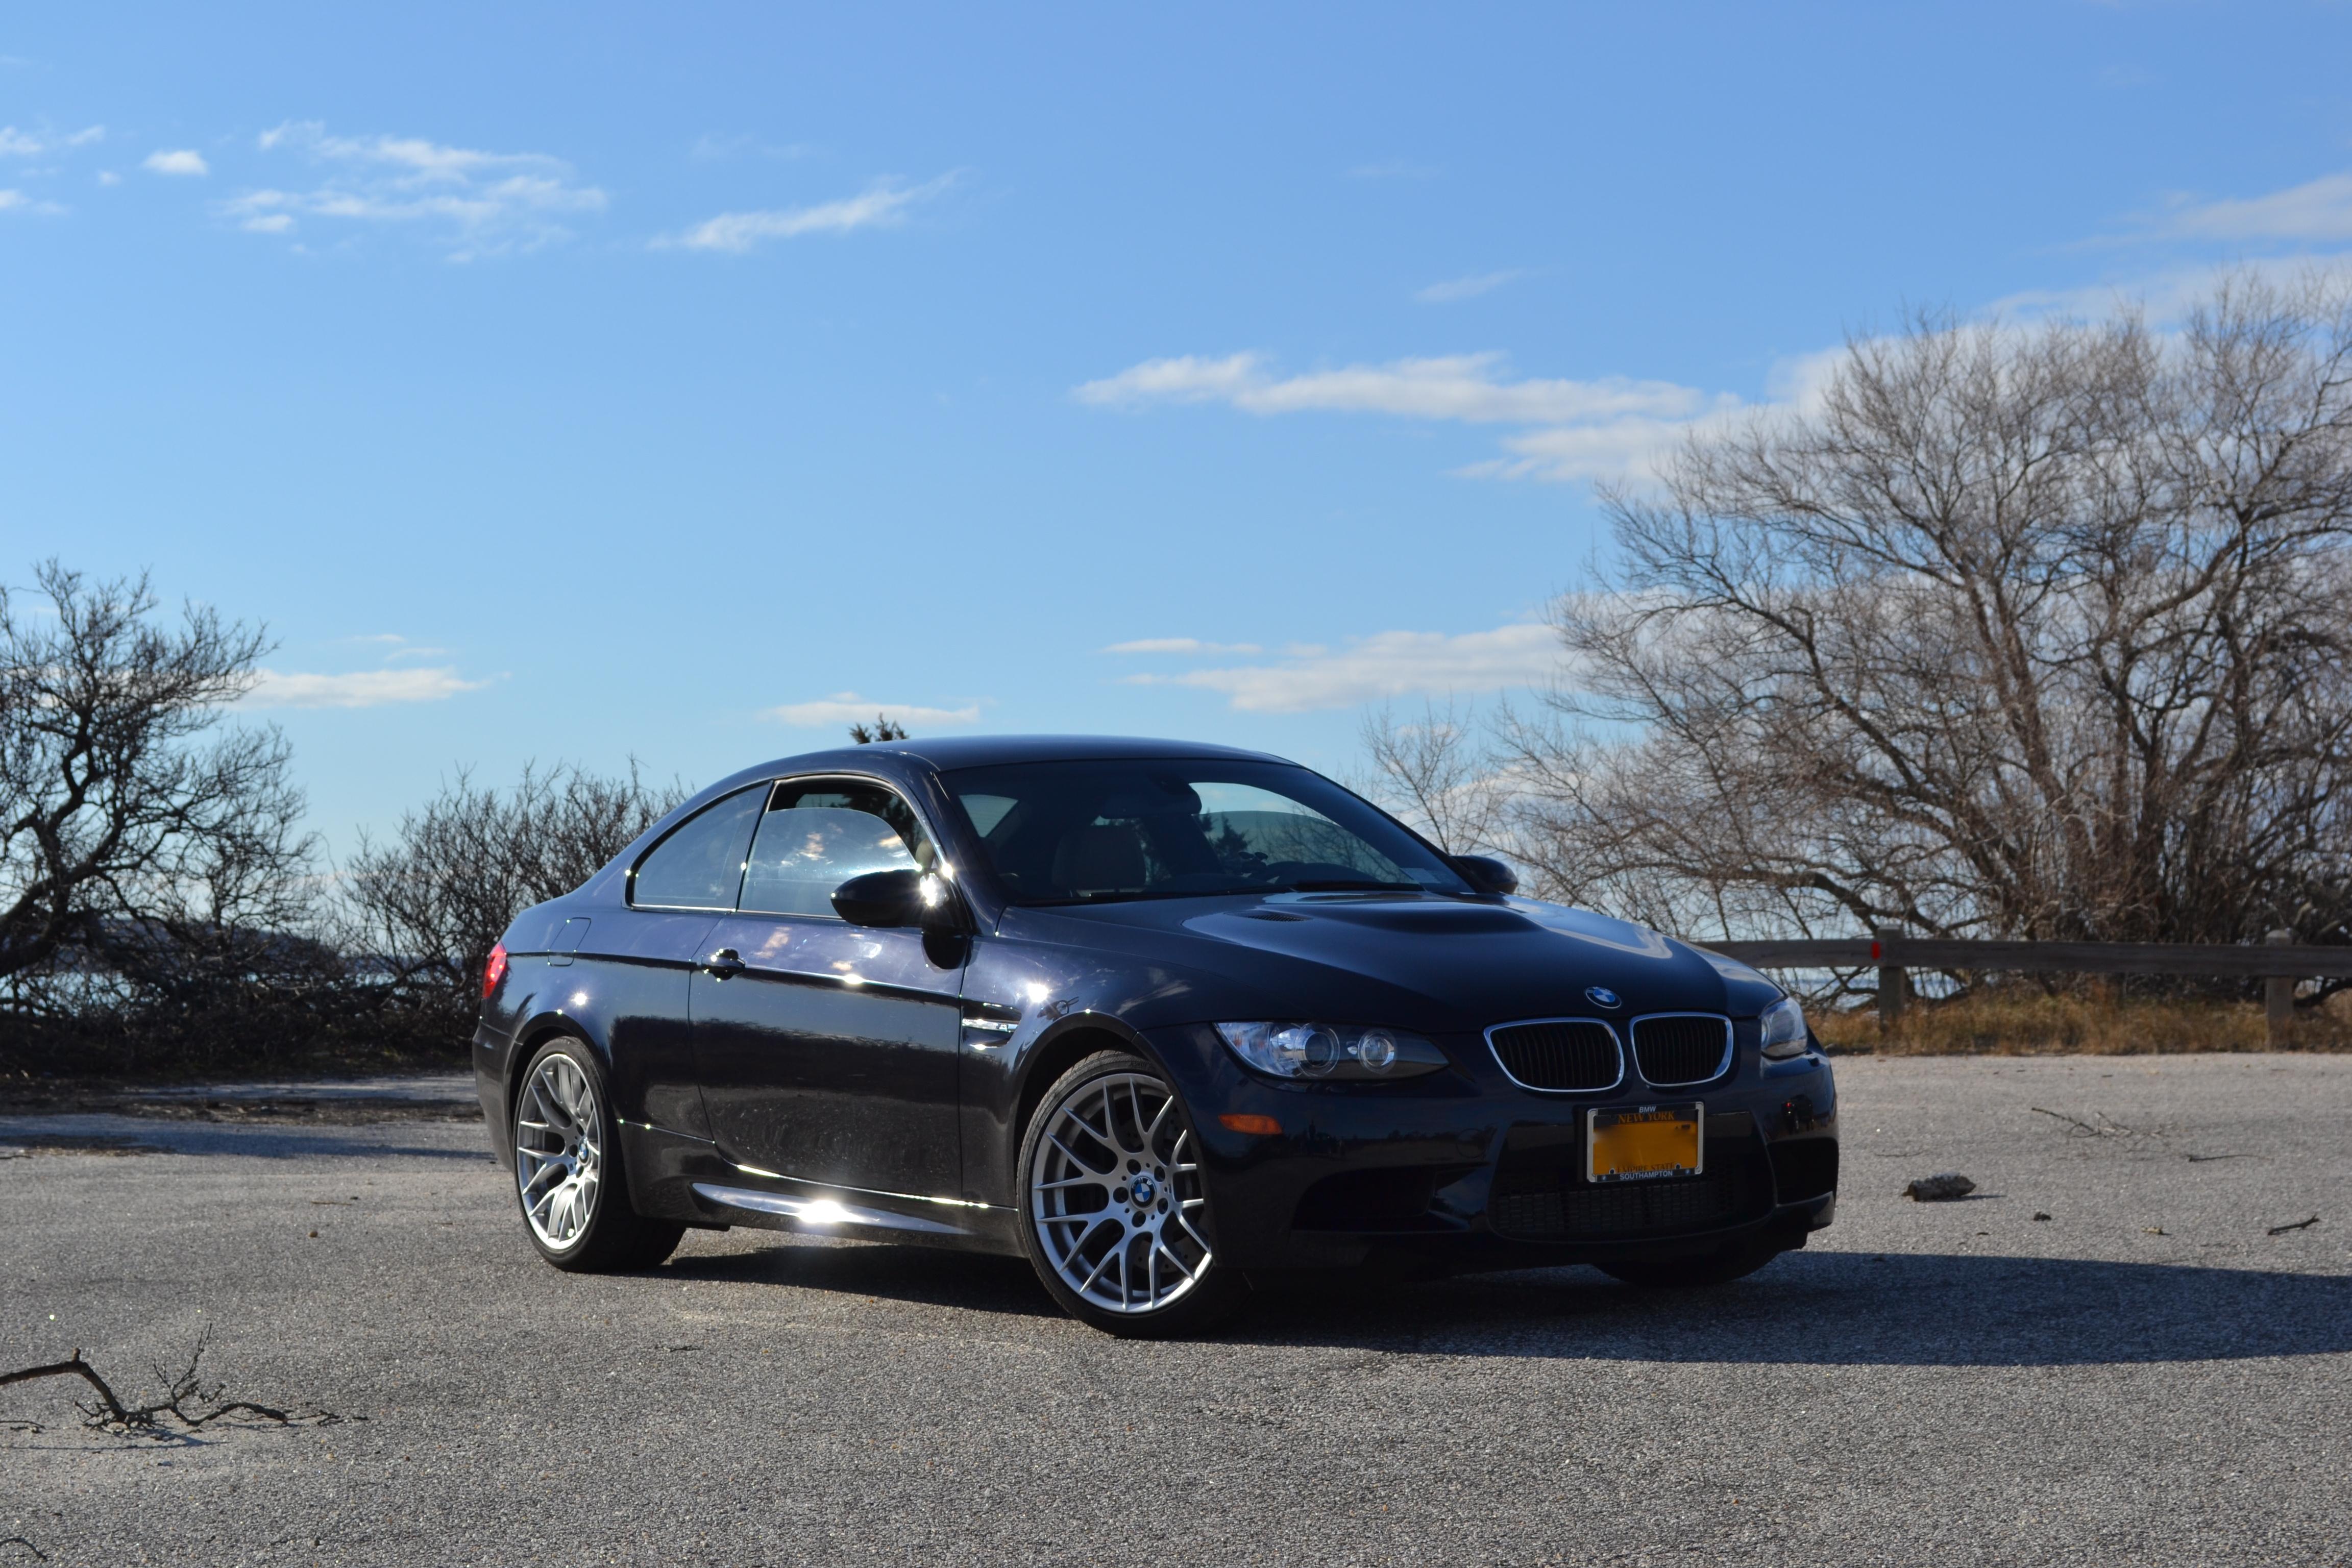 Review 2013 Bmw M3 Competition E92 Why S It So Legit Drivehamptons Com